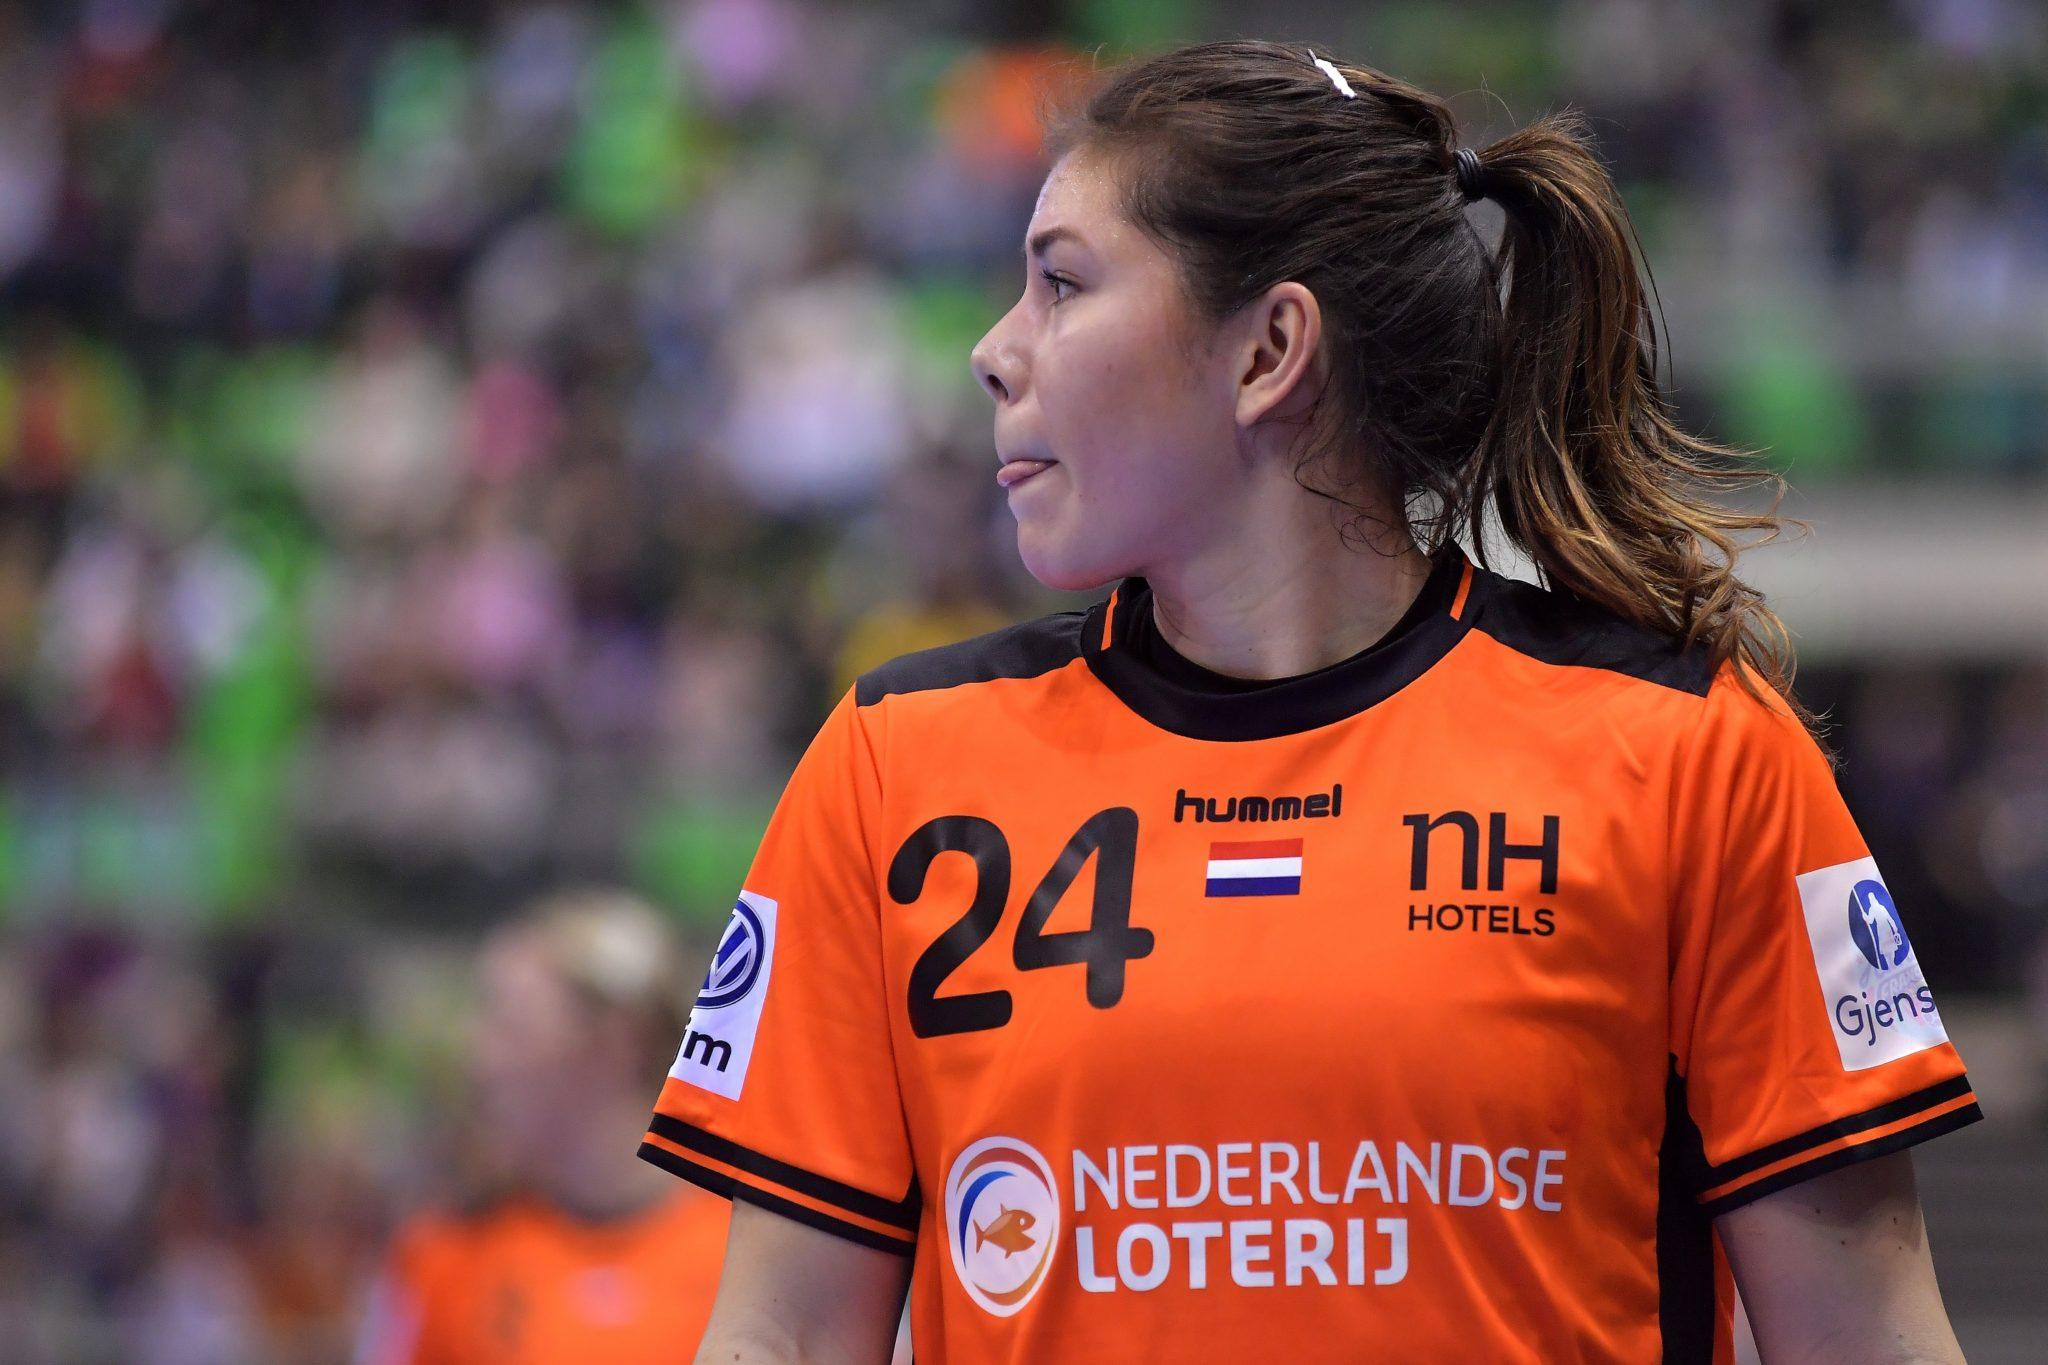 3-12-2018 HANDBAL:NEDERLAND-SPANJE:MONTBELIARD EK Handbal In Frankrijk, Voorronde Groep C Nederland - Spanje Martine Smeets #24 NED